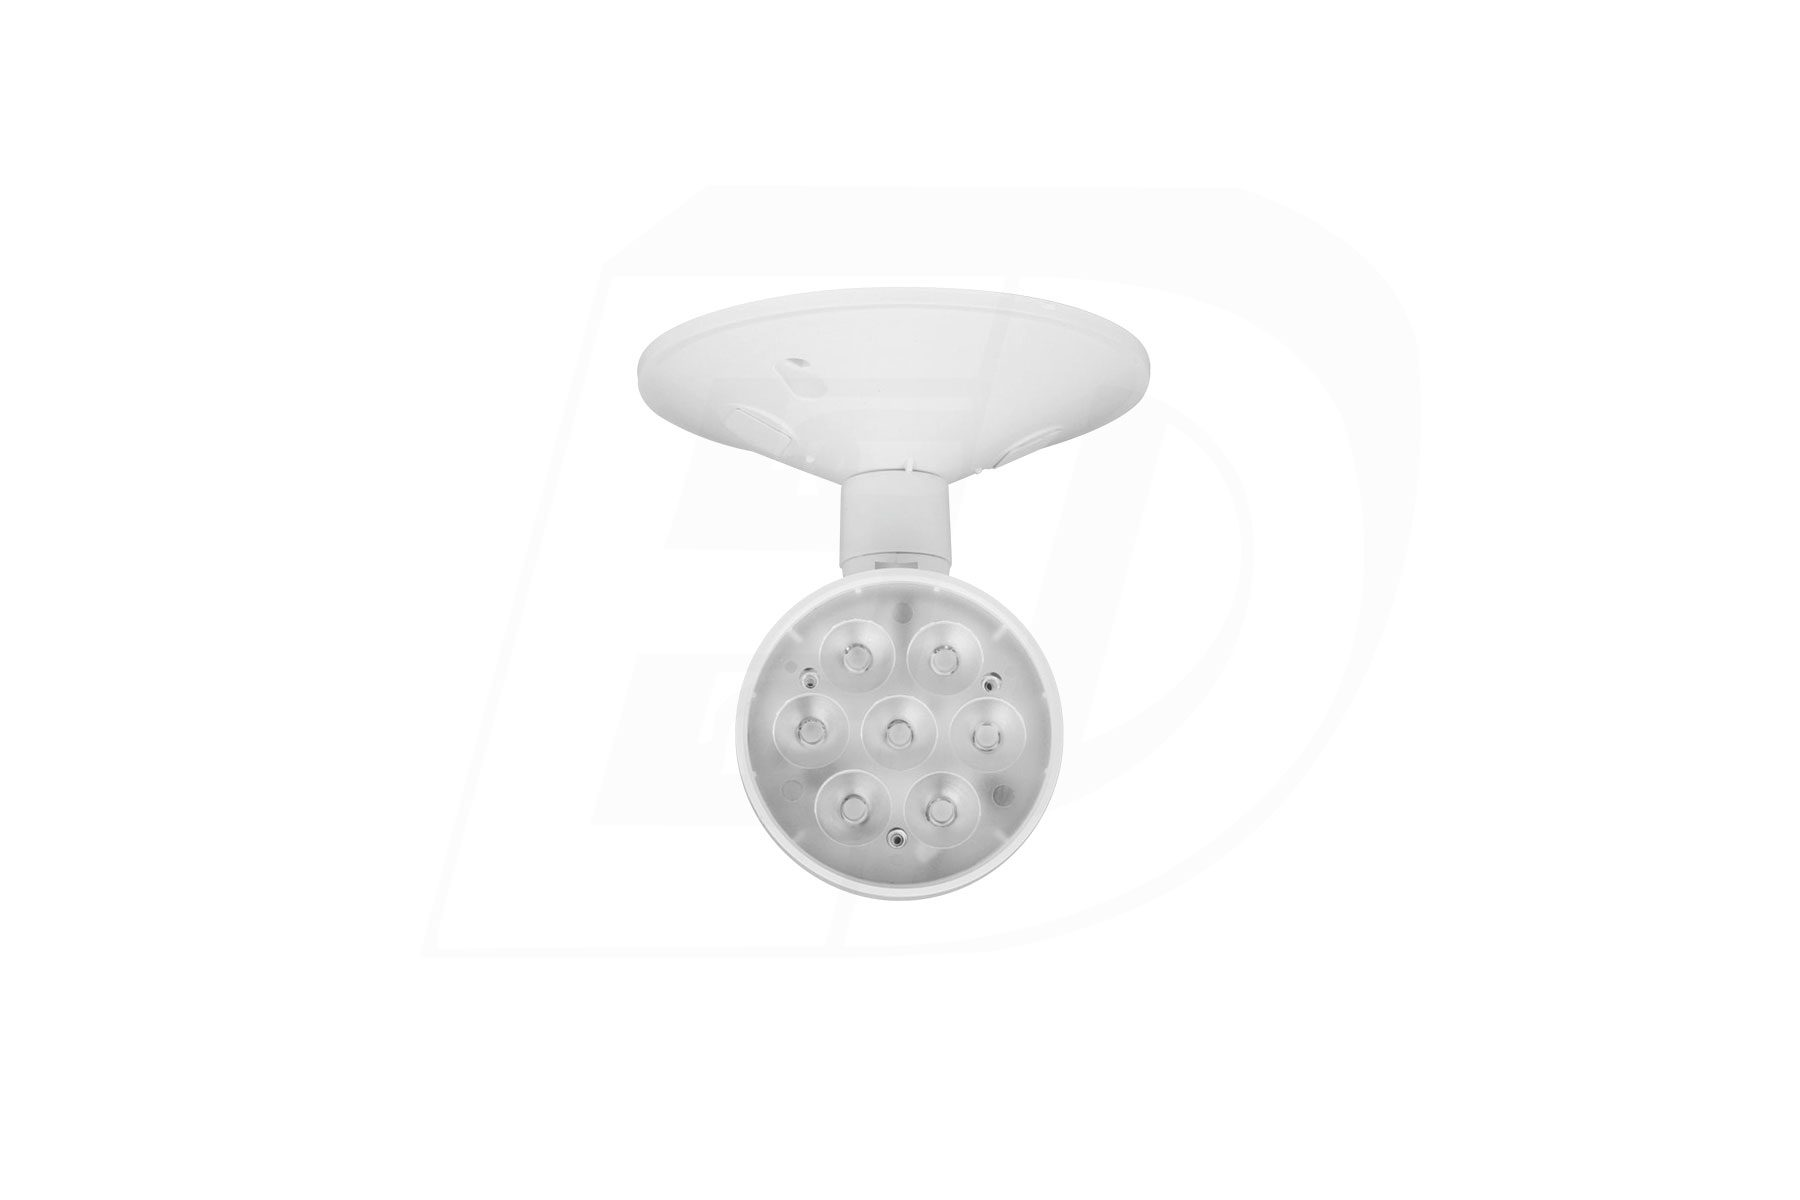 ER270SWH-UD7 - LED SINGLE REMOTE HEAD EMERGENCY LIGHT